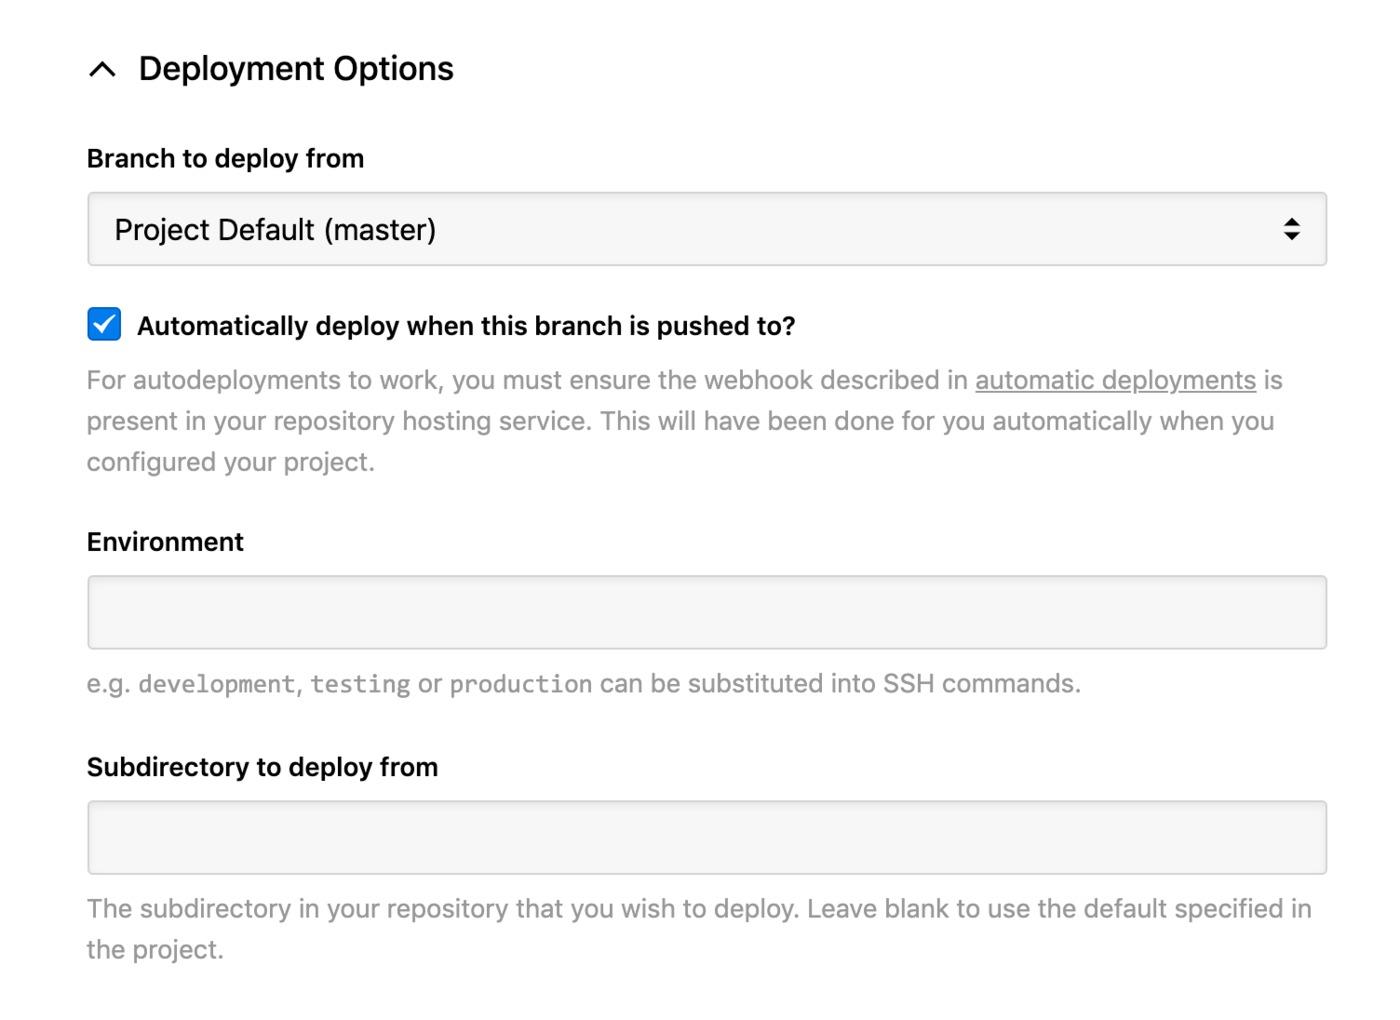 DigitalOcean - deployment options